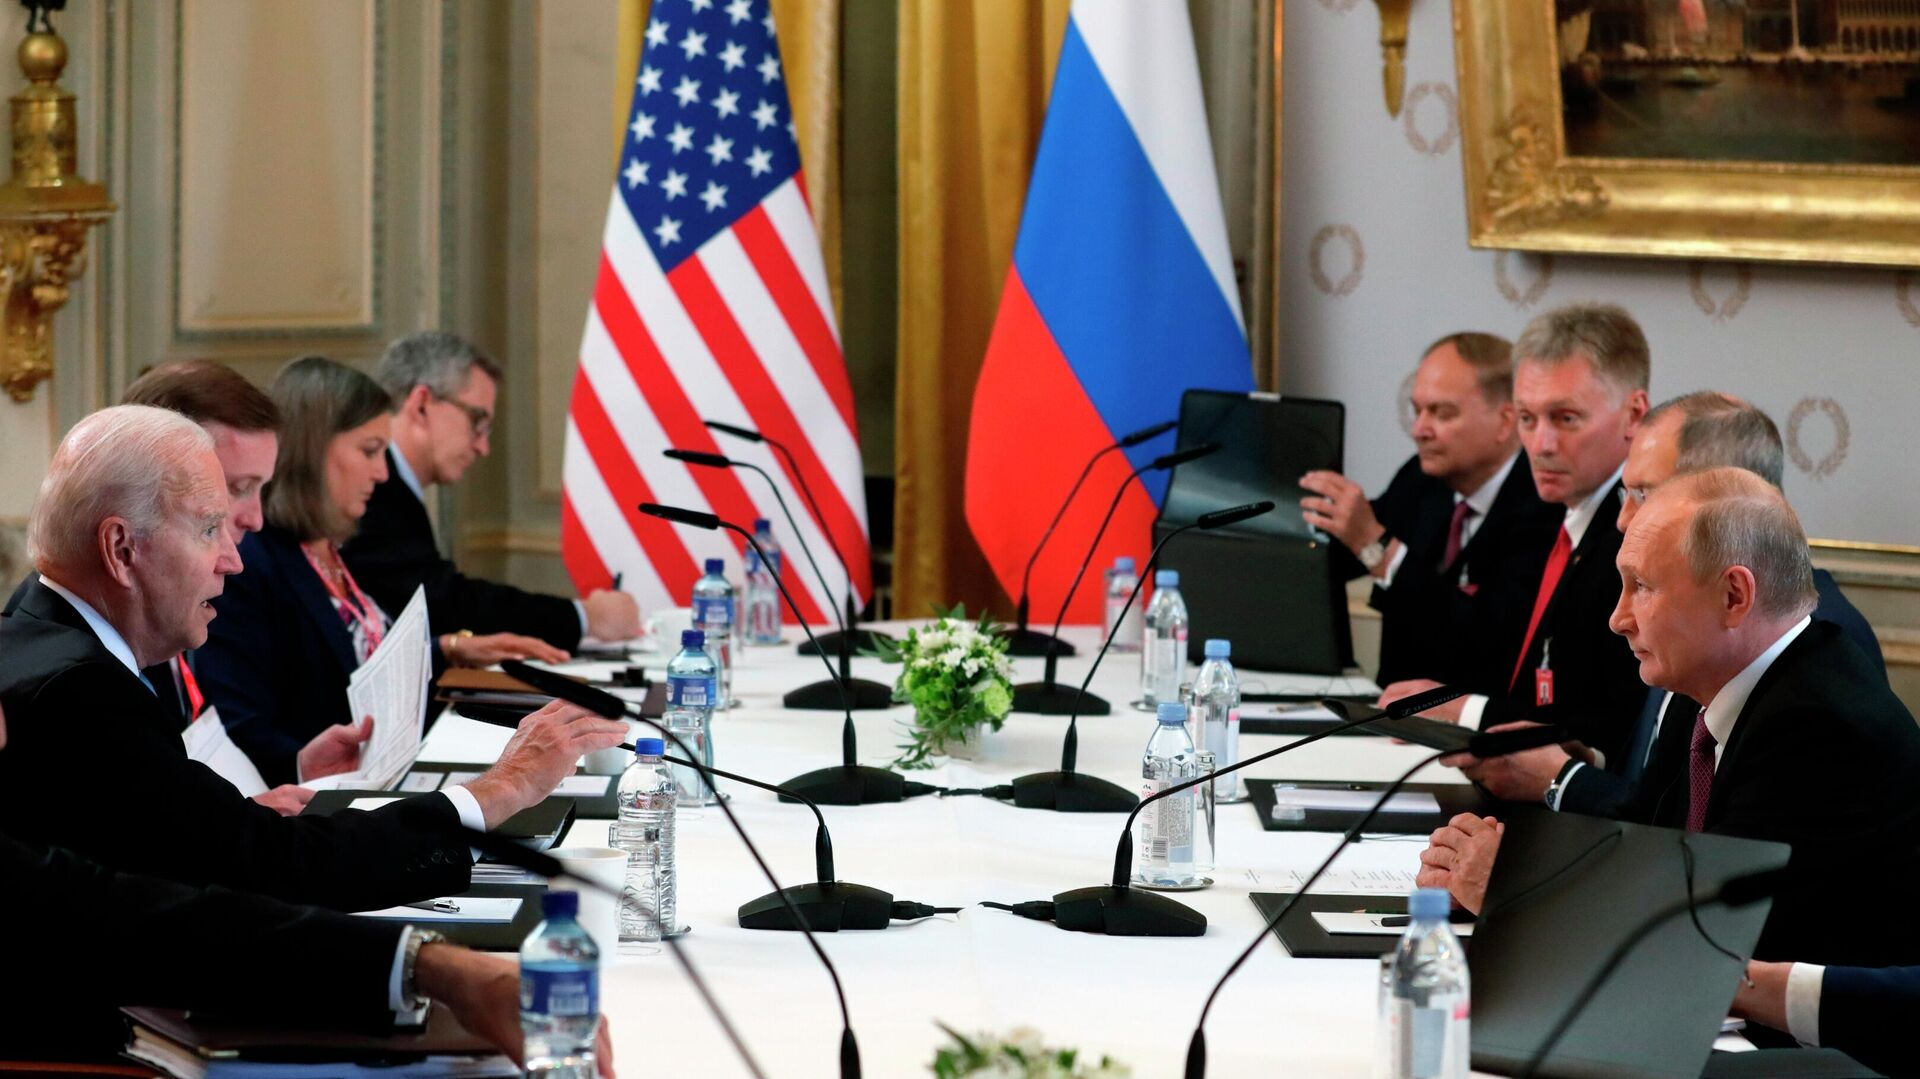 La cumbre entre Joe Biden y Vladímir Putin en Ginebra - Sputnik Mundo, 1920, 16.06.2021